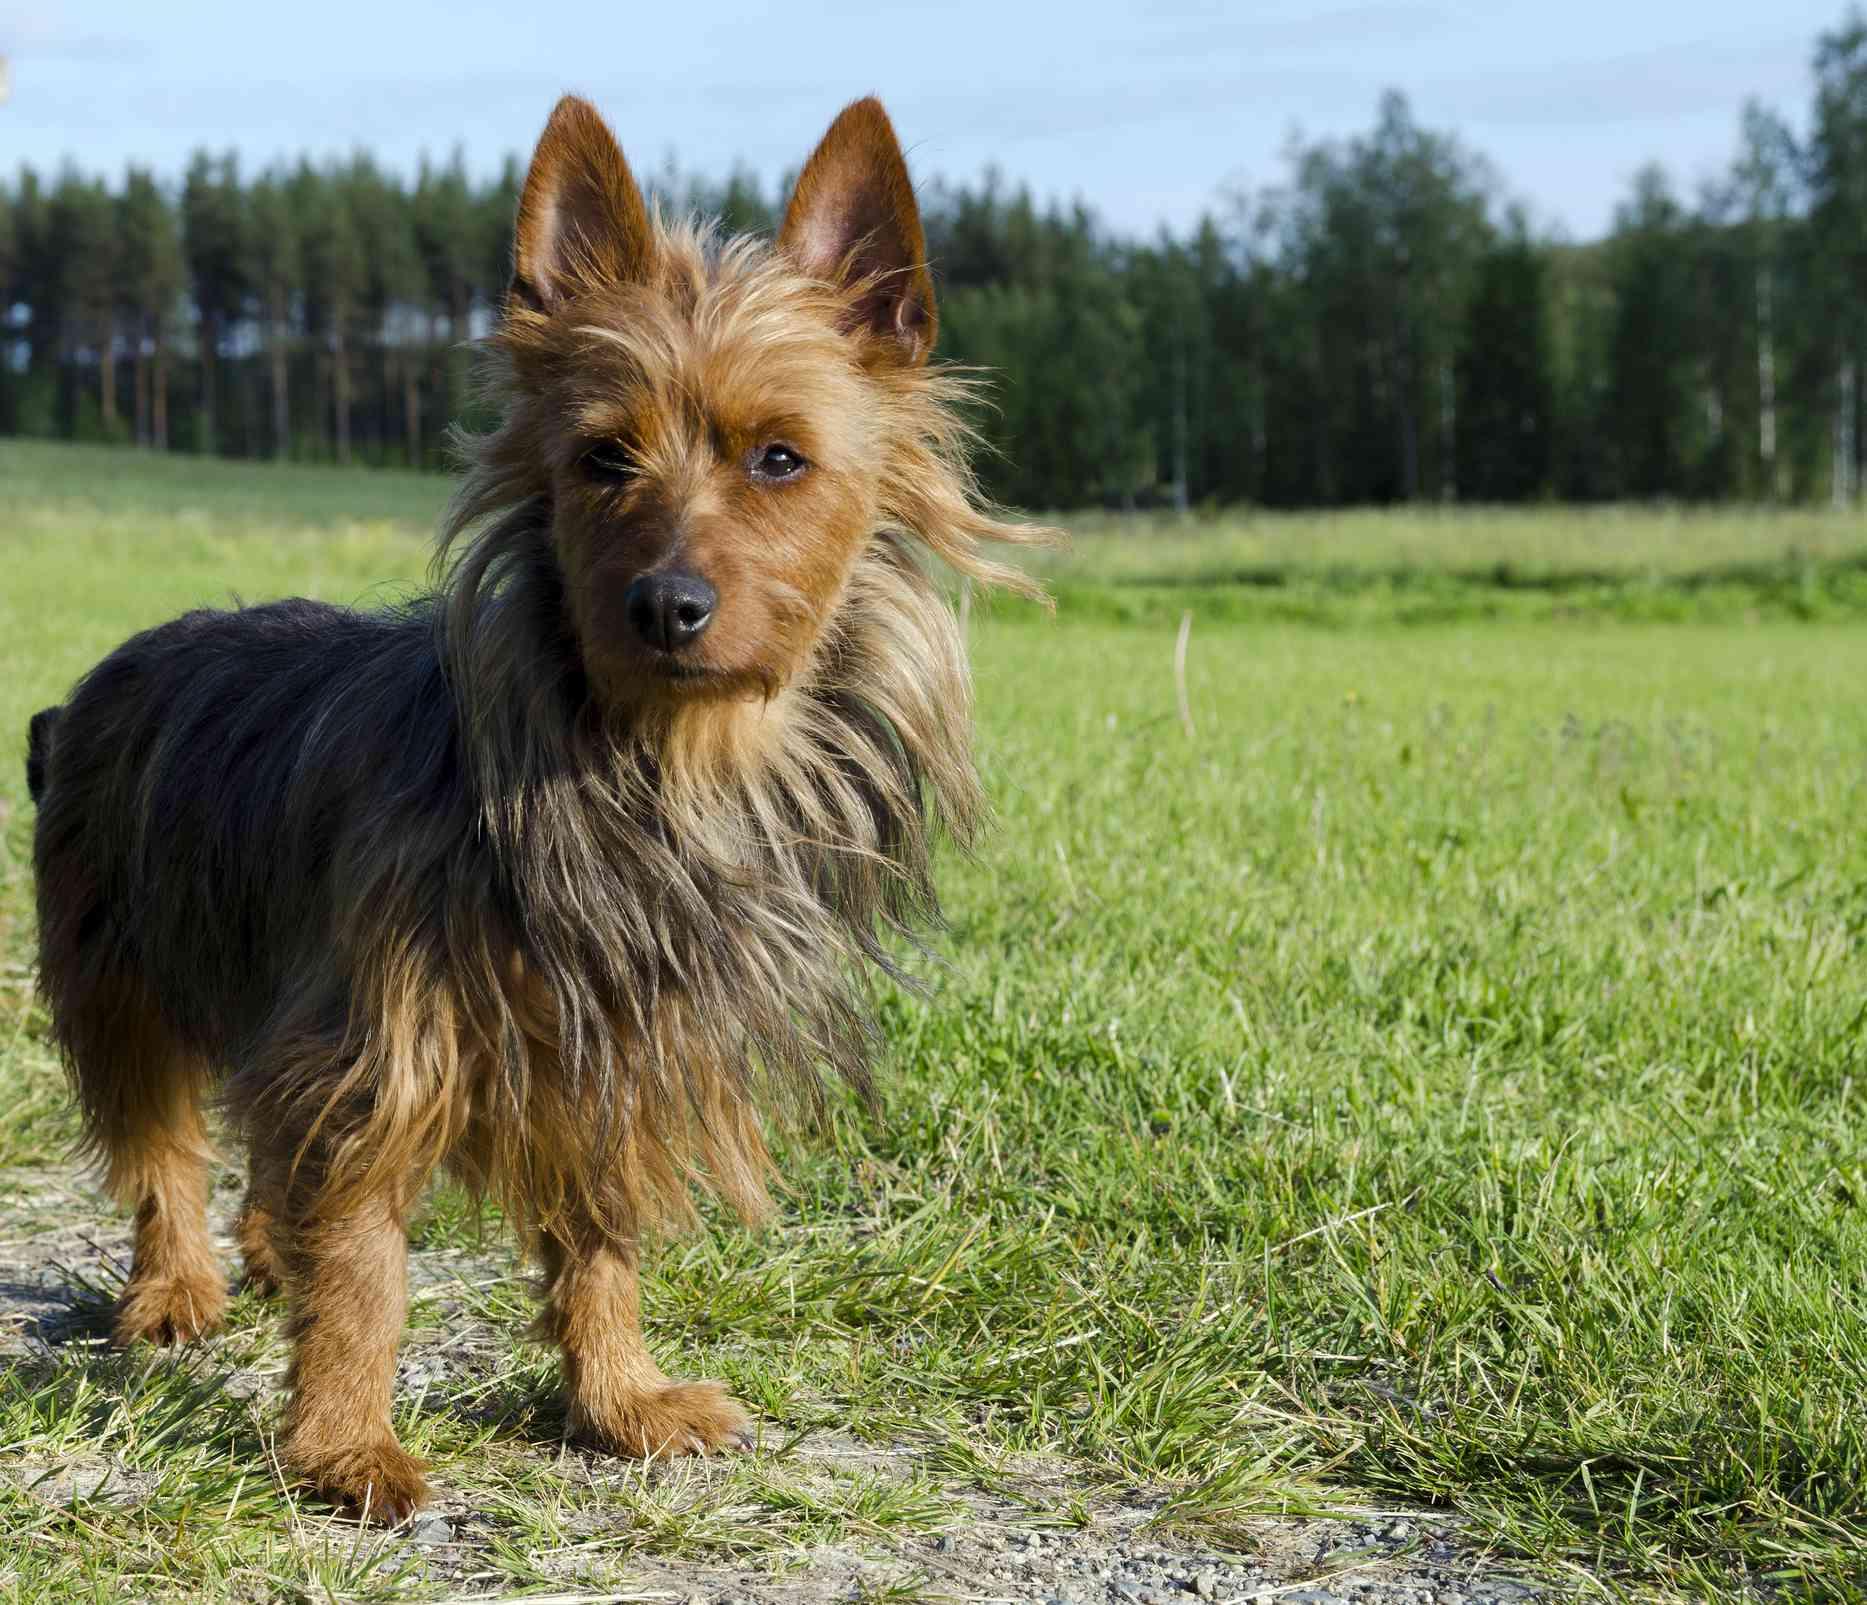 Australian terrier standing on grass